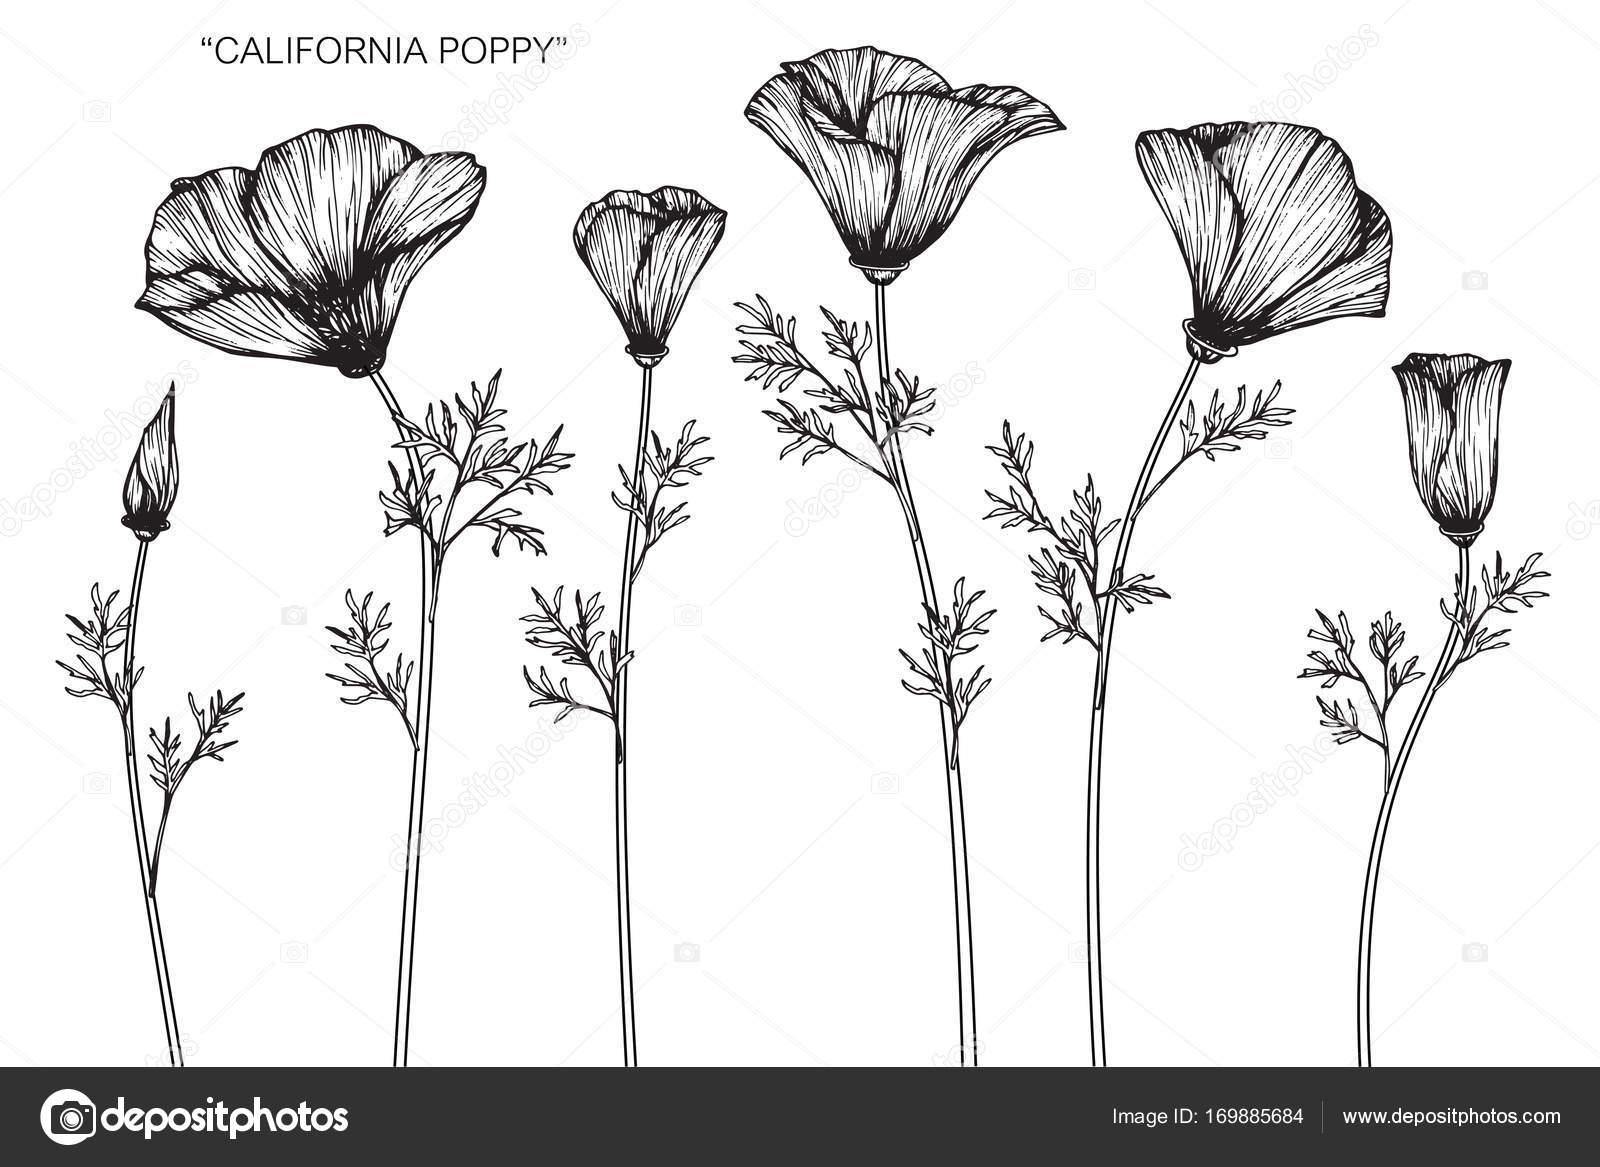 California poppy flowers drawing sketch line art white backgrounds california poppy flowers drawing and sketch with line art on white backgrounds vector by suwi19 mightylinksfo